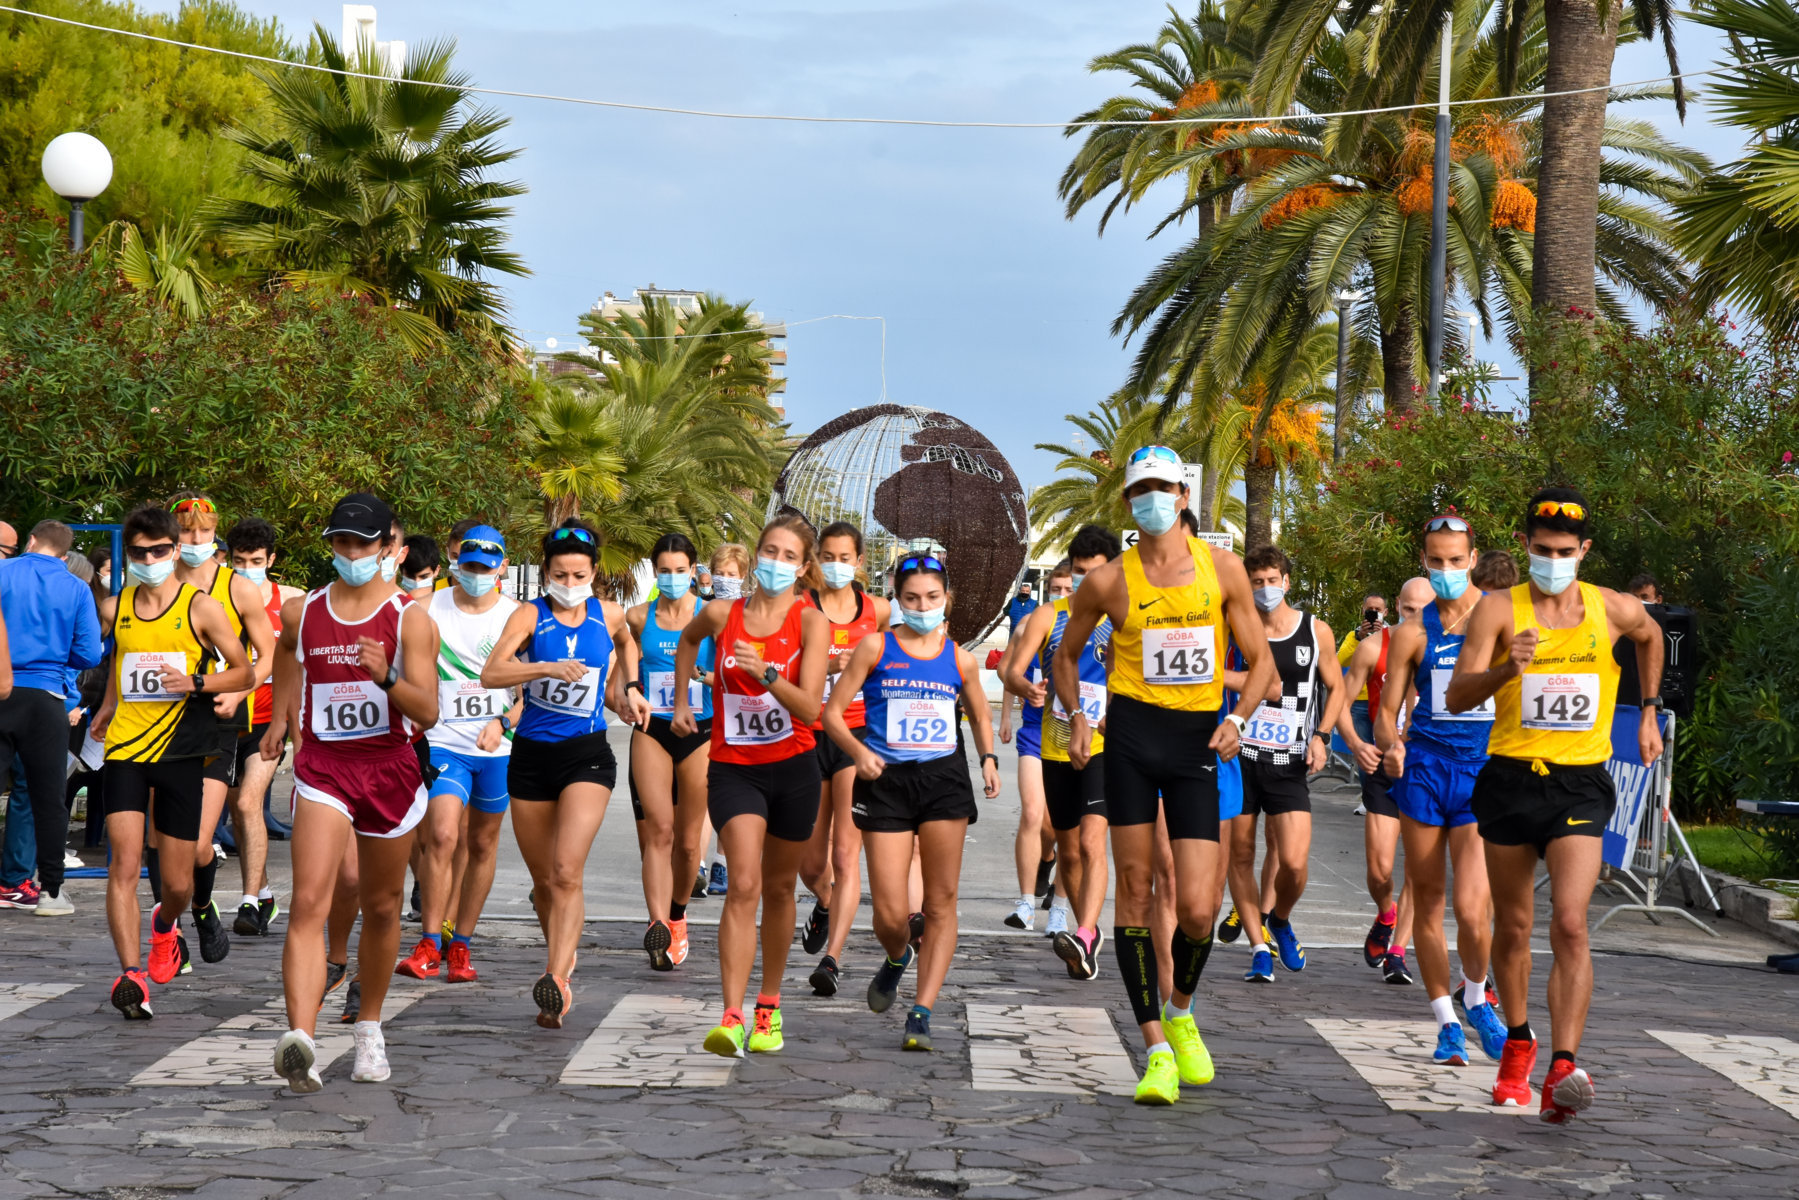 Grottammare. Campionati Allievi di 10km – CdS Ass e Master